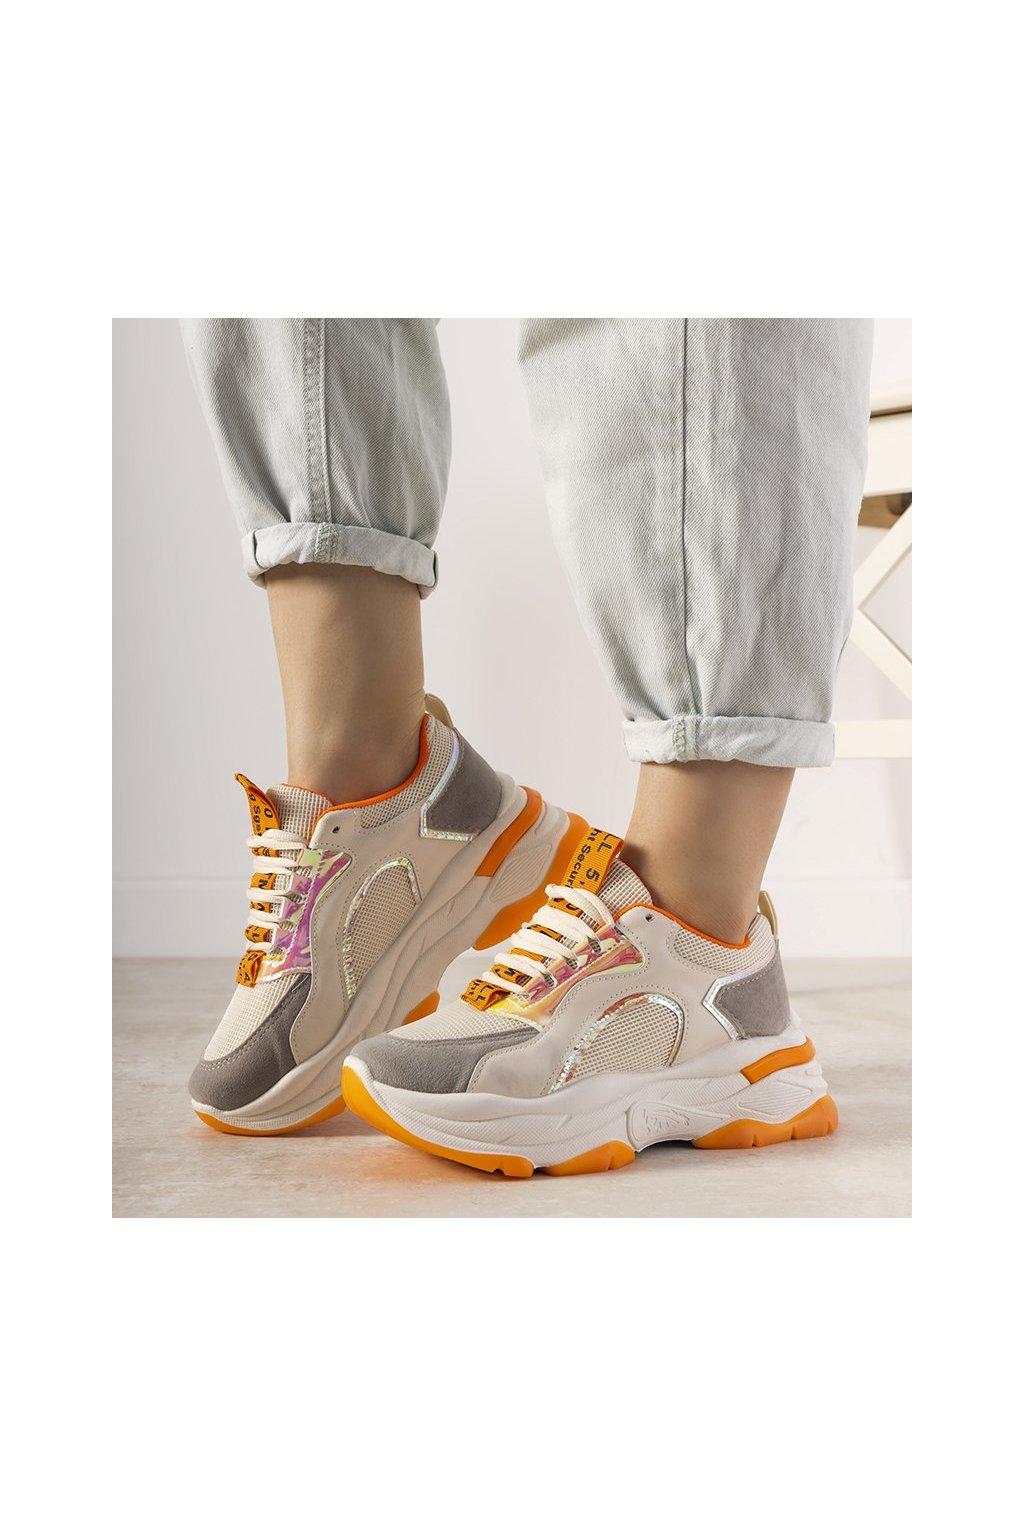 Dámske topánky tenisky biele kód R12YD518-11 - GM